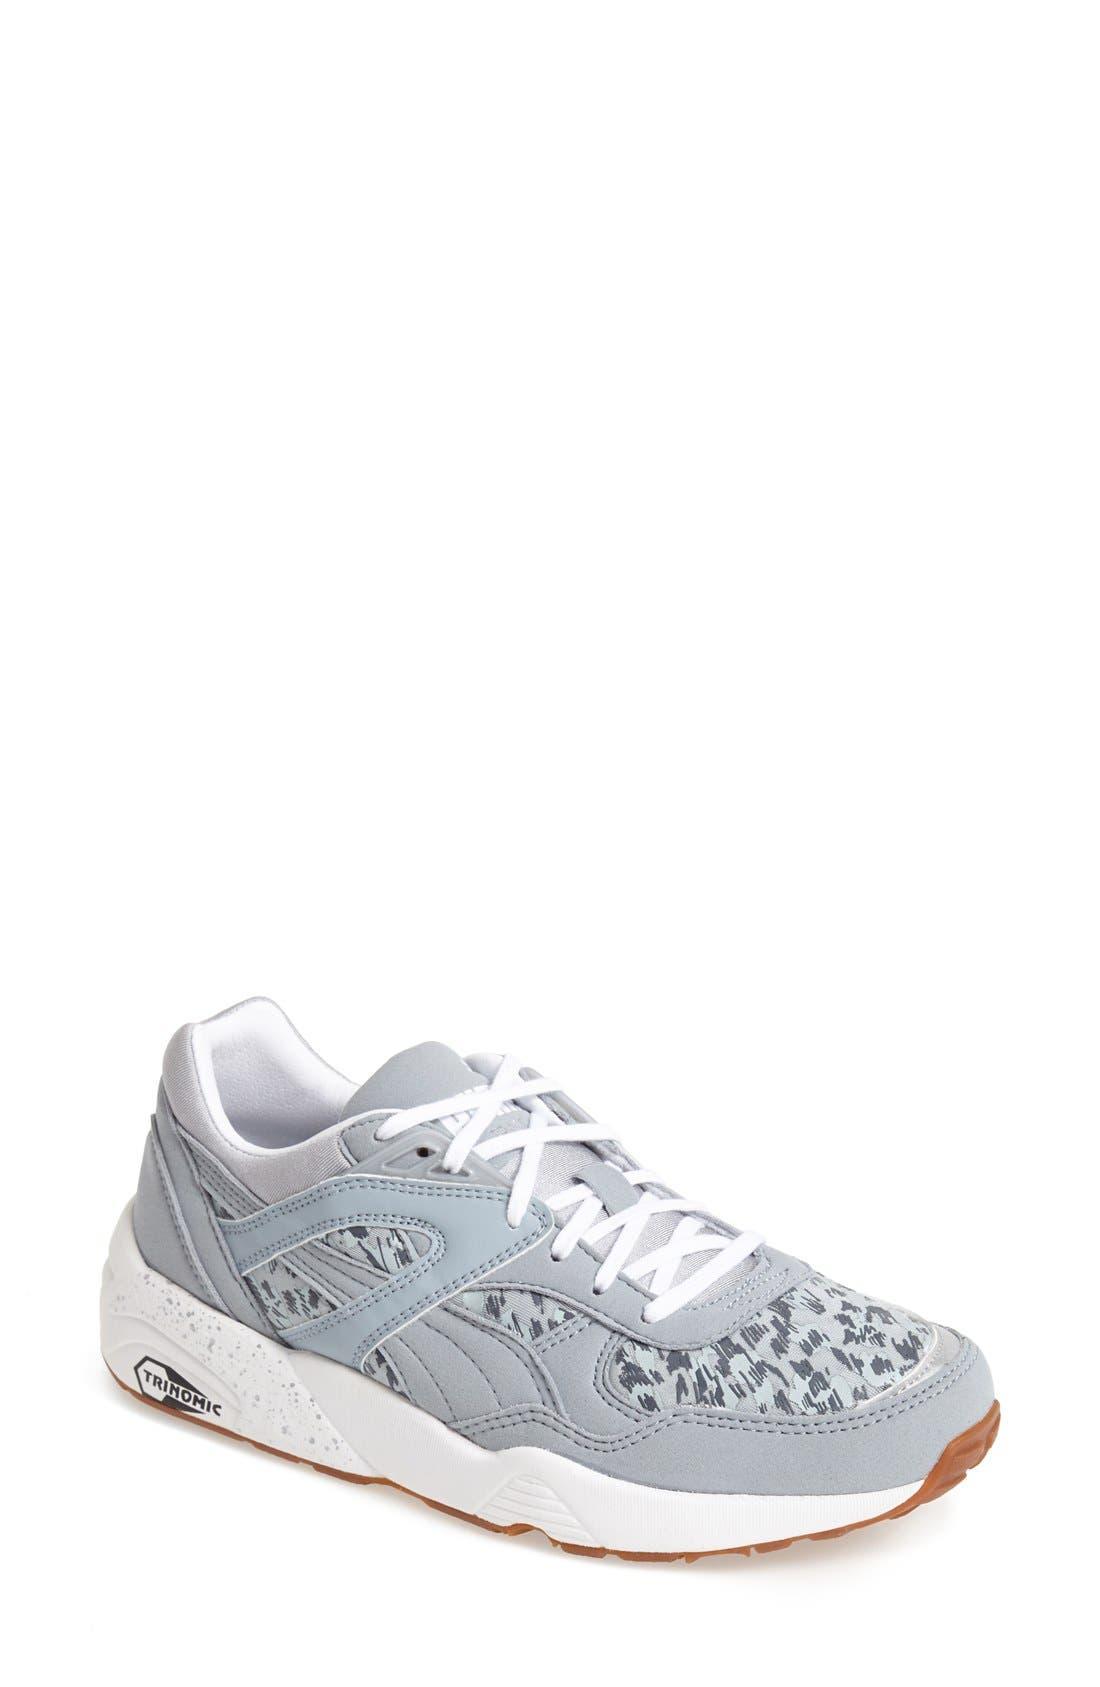 Main Image - PUMA 'Trinomic R698' Sneaker (Women)